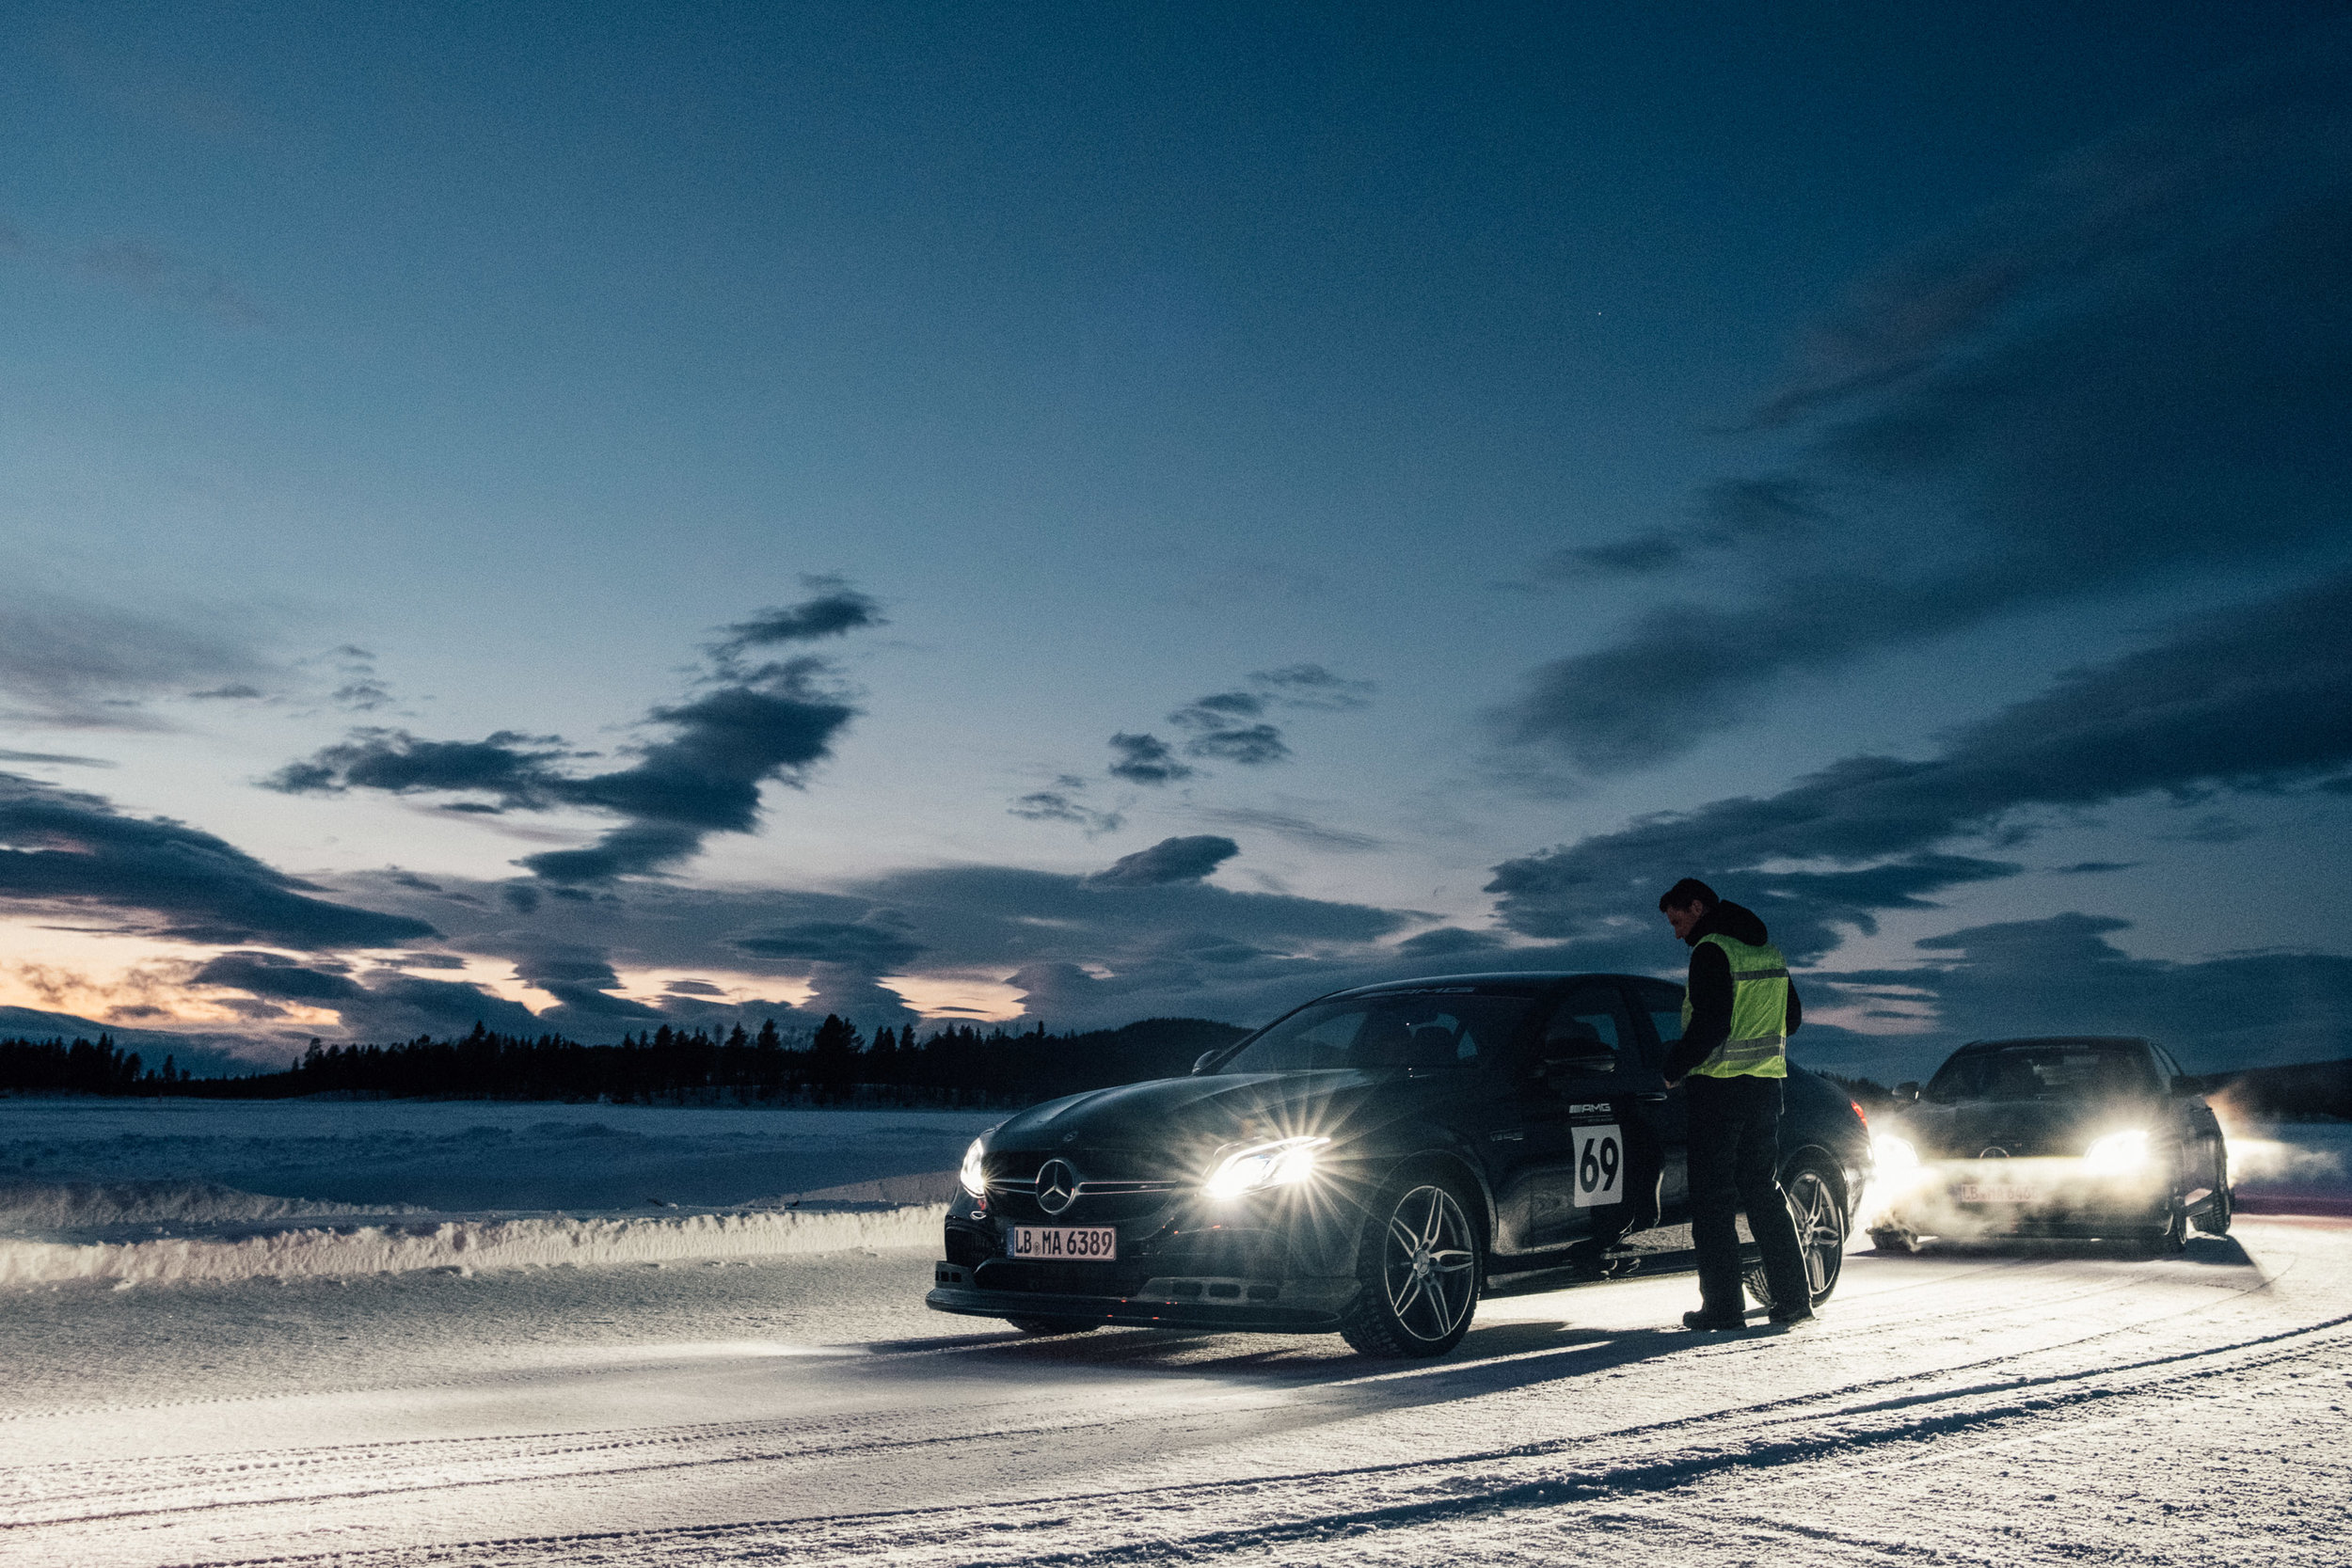 Drive_for_Good_Ice_Drive_by_Maxim_Kuijper-8936.jpg